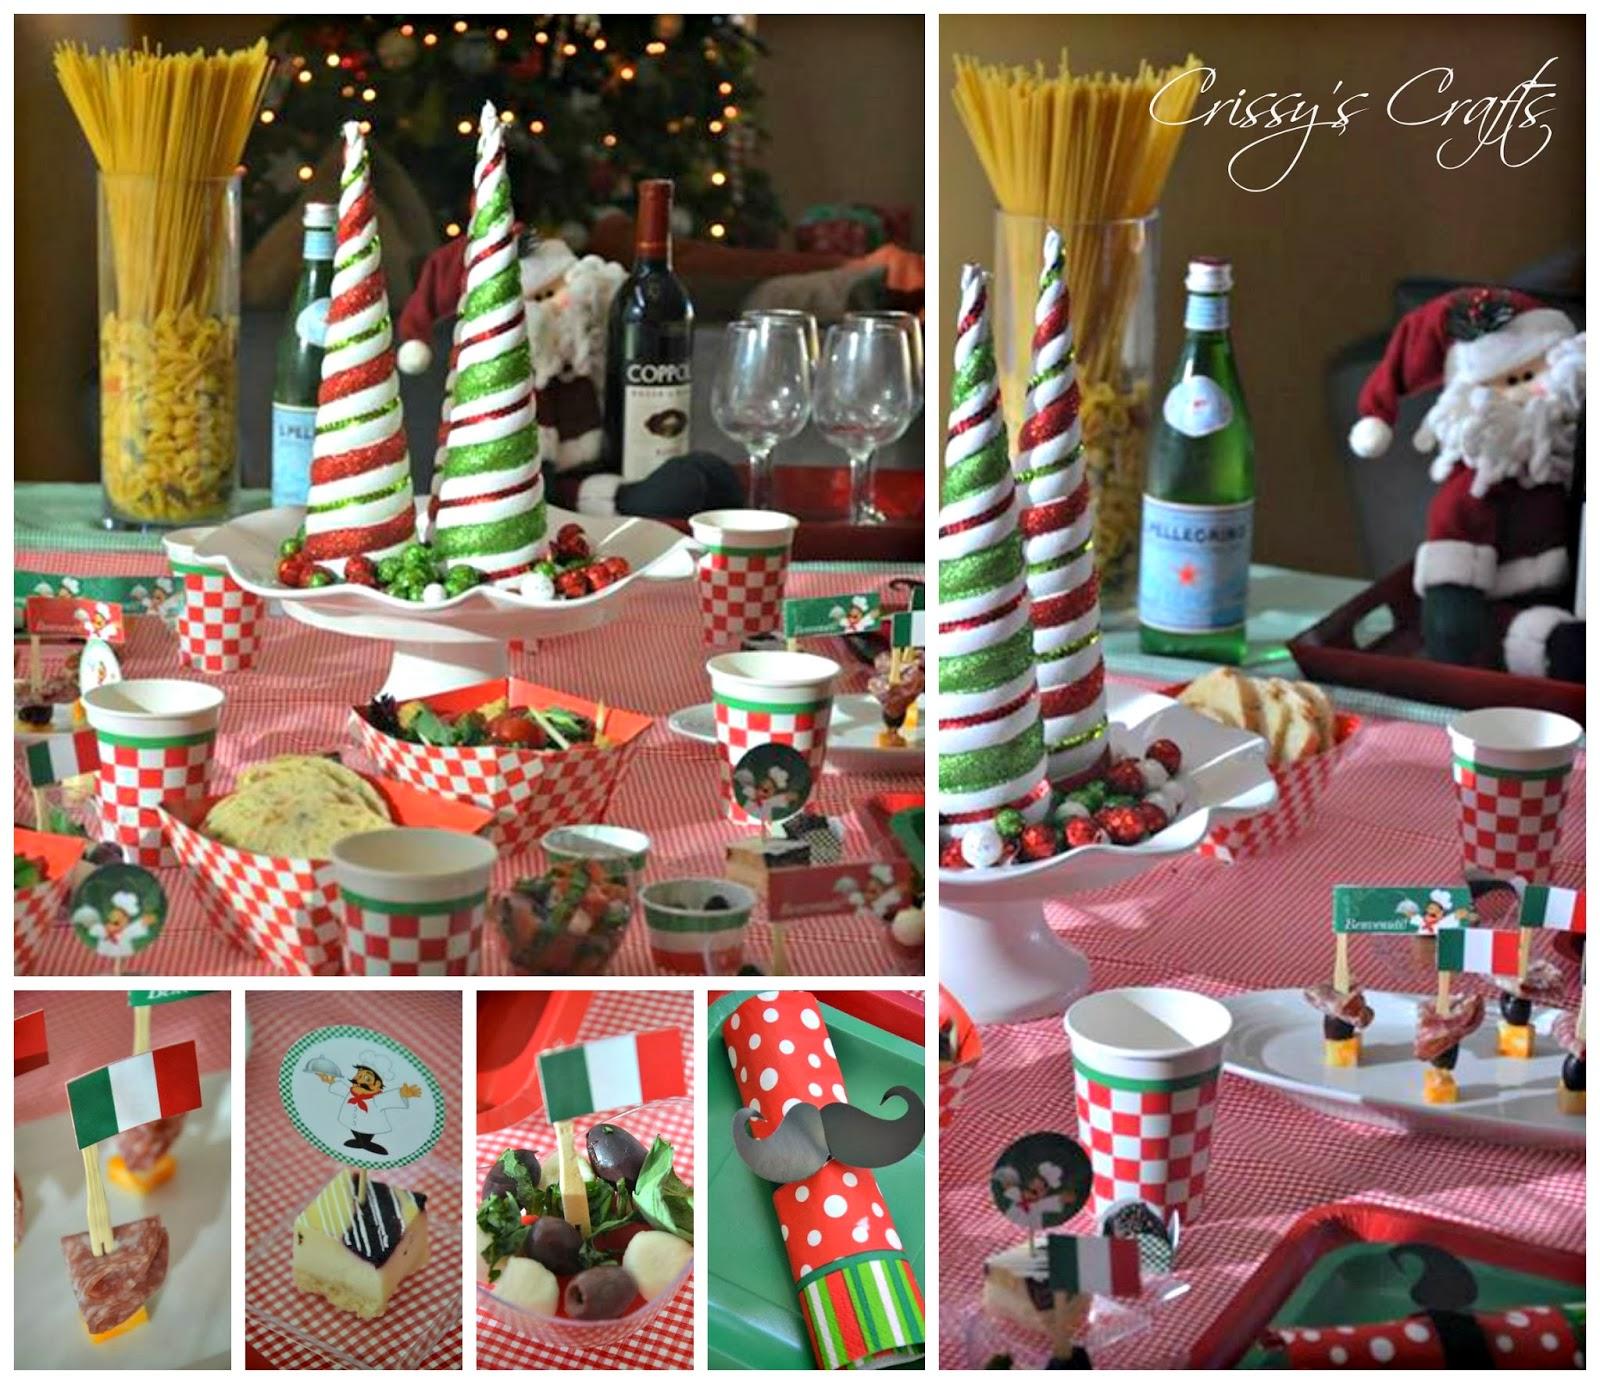 Crissy 39 s crafts italian holiday night for Italian party